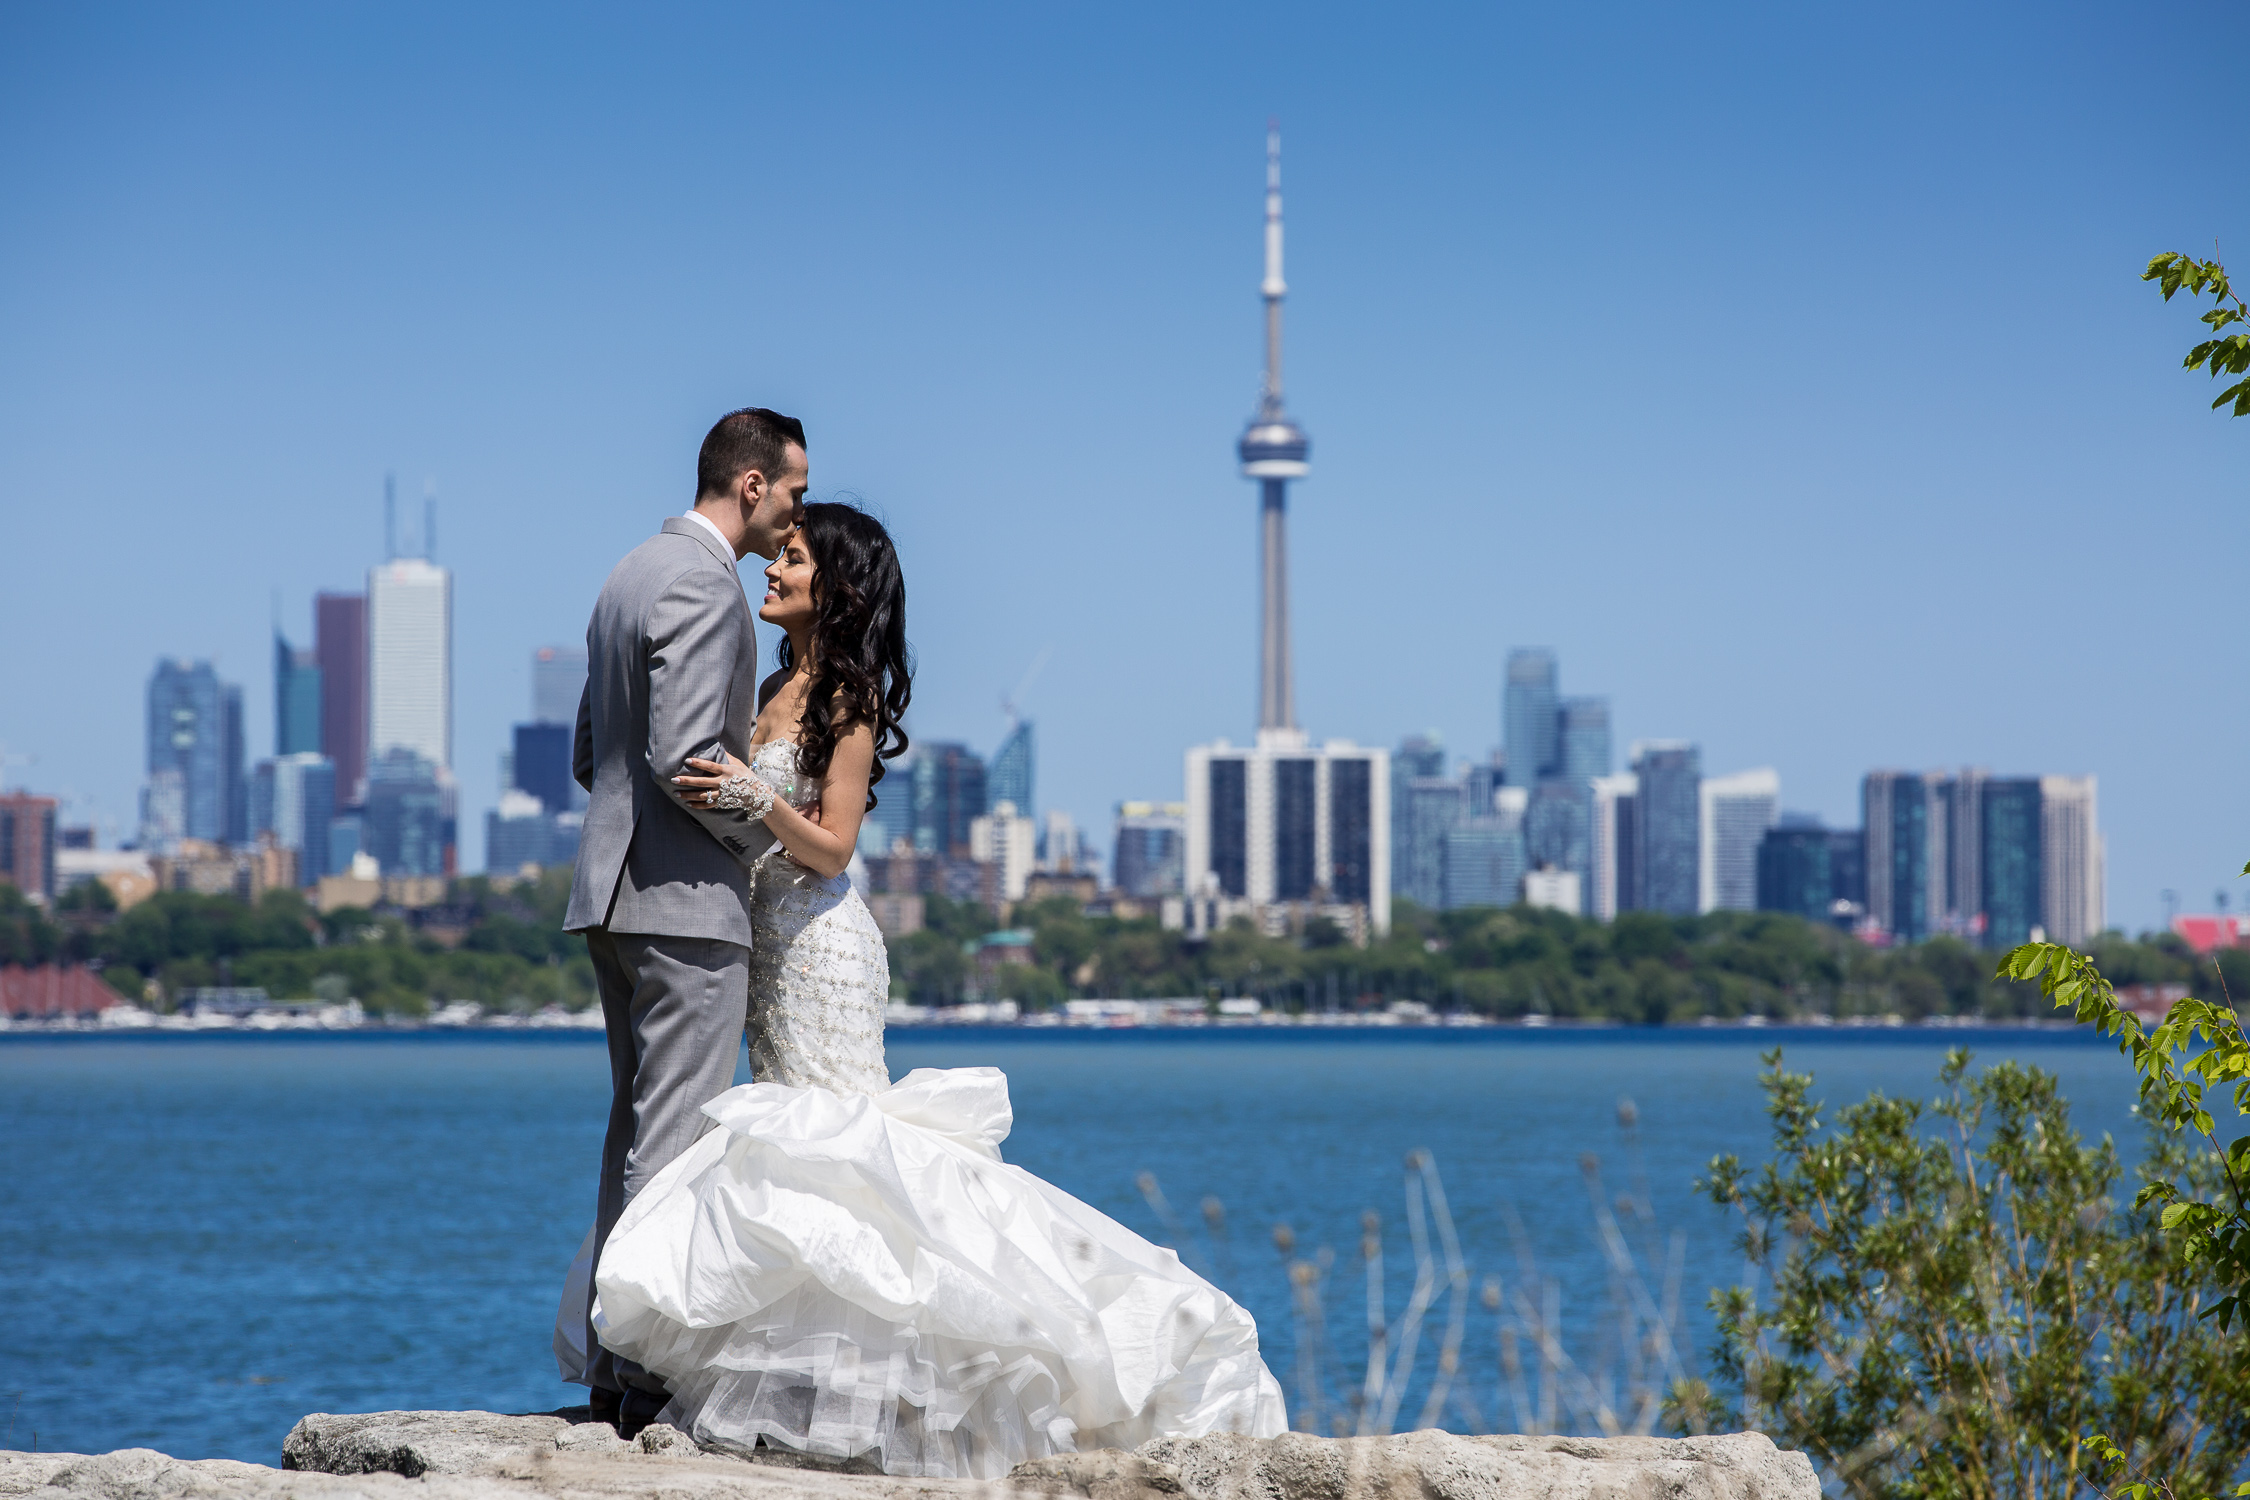 Paradise-Banquet-Hall-Wedding-Vaughan-Ontario-0063.jpg